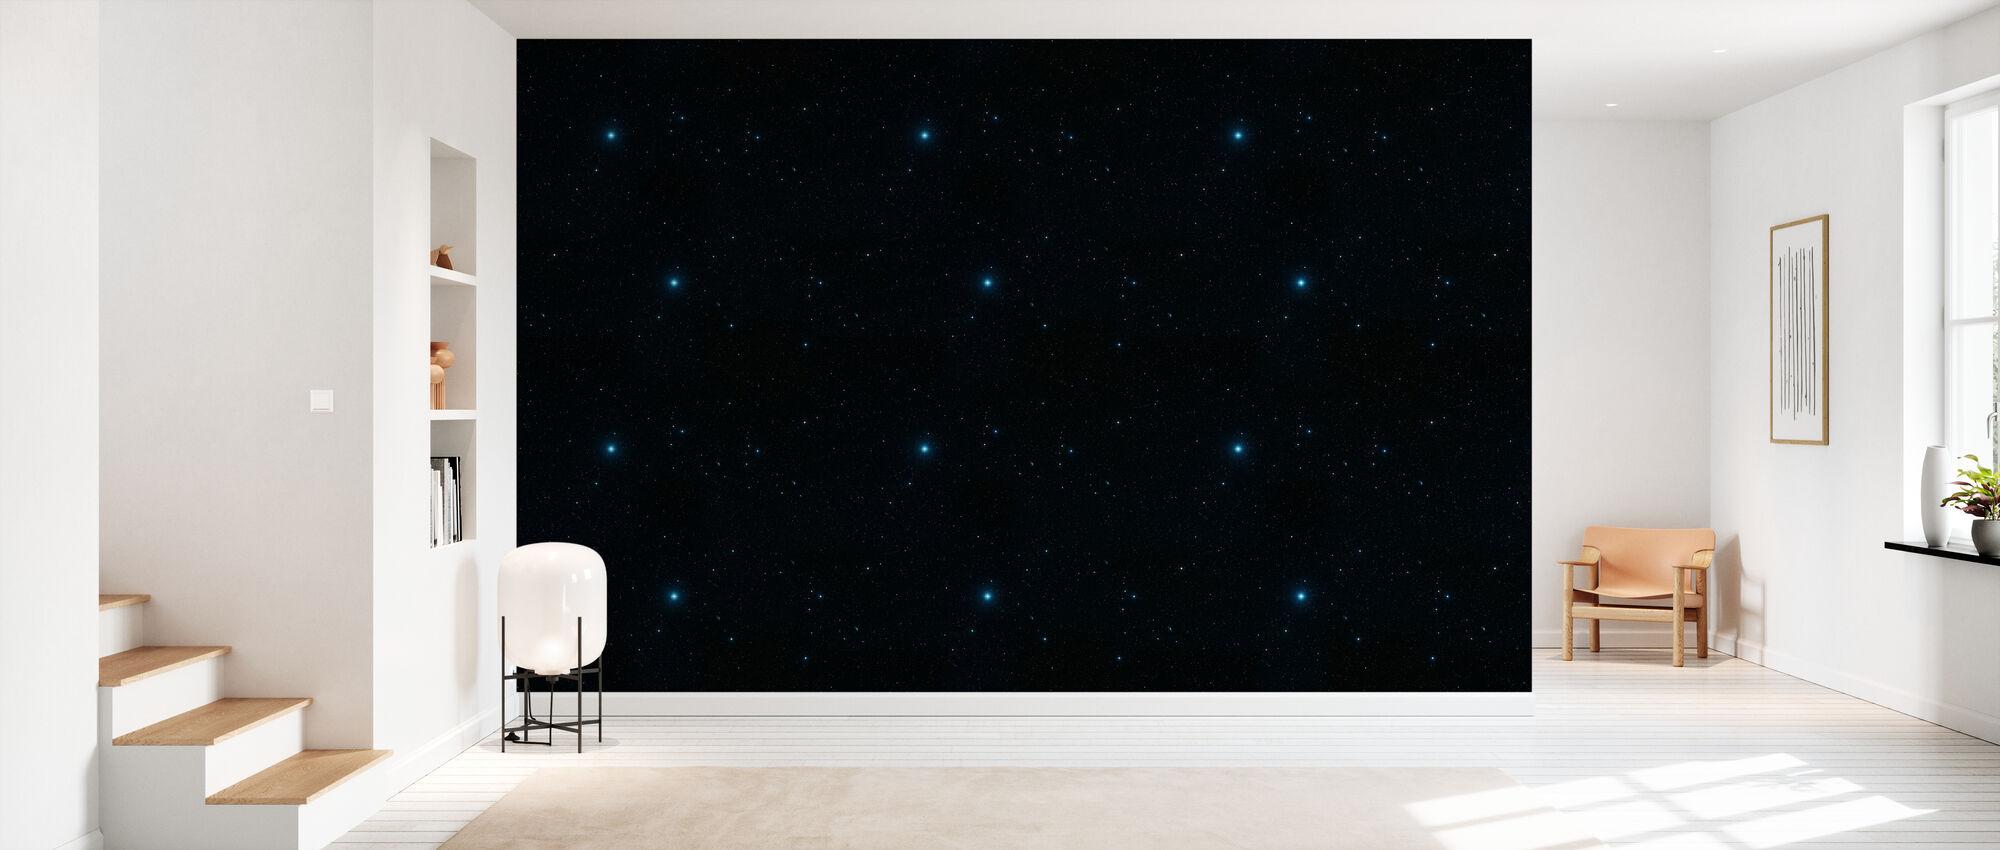 Starly - Wallpaper - Hallway